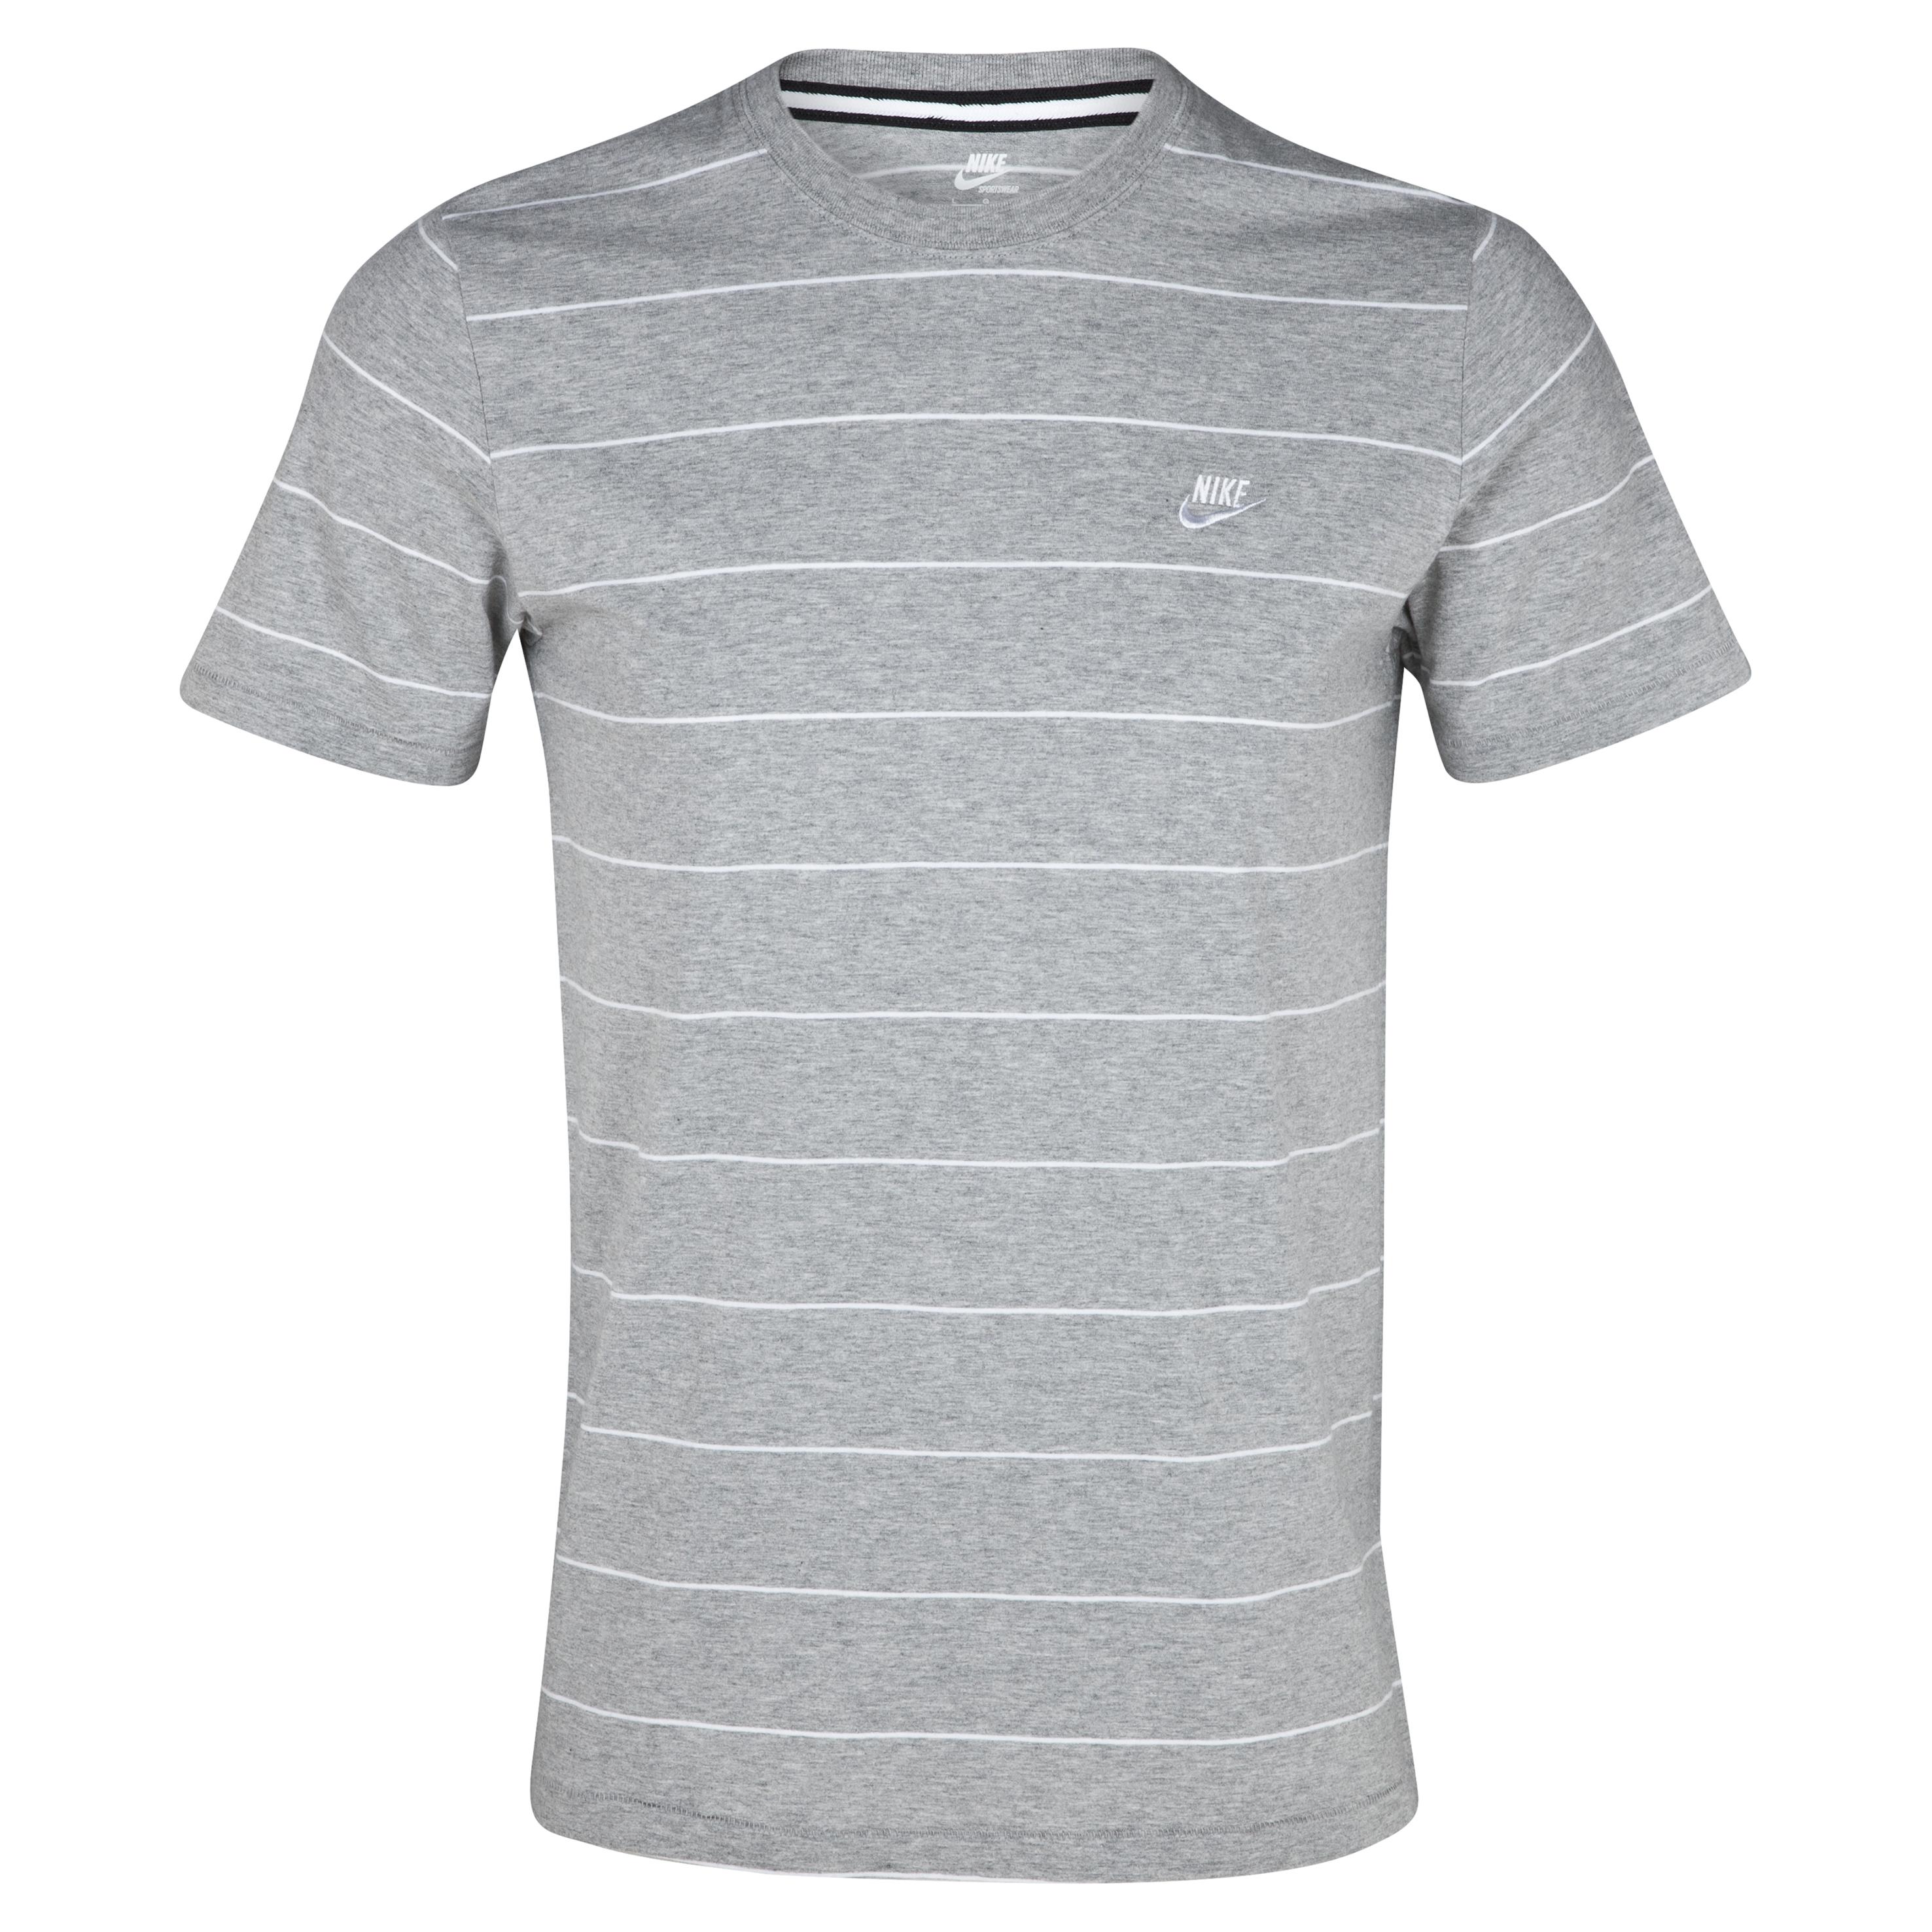 Nike YD Striped Futura Tee - Dark Grey Heather/White